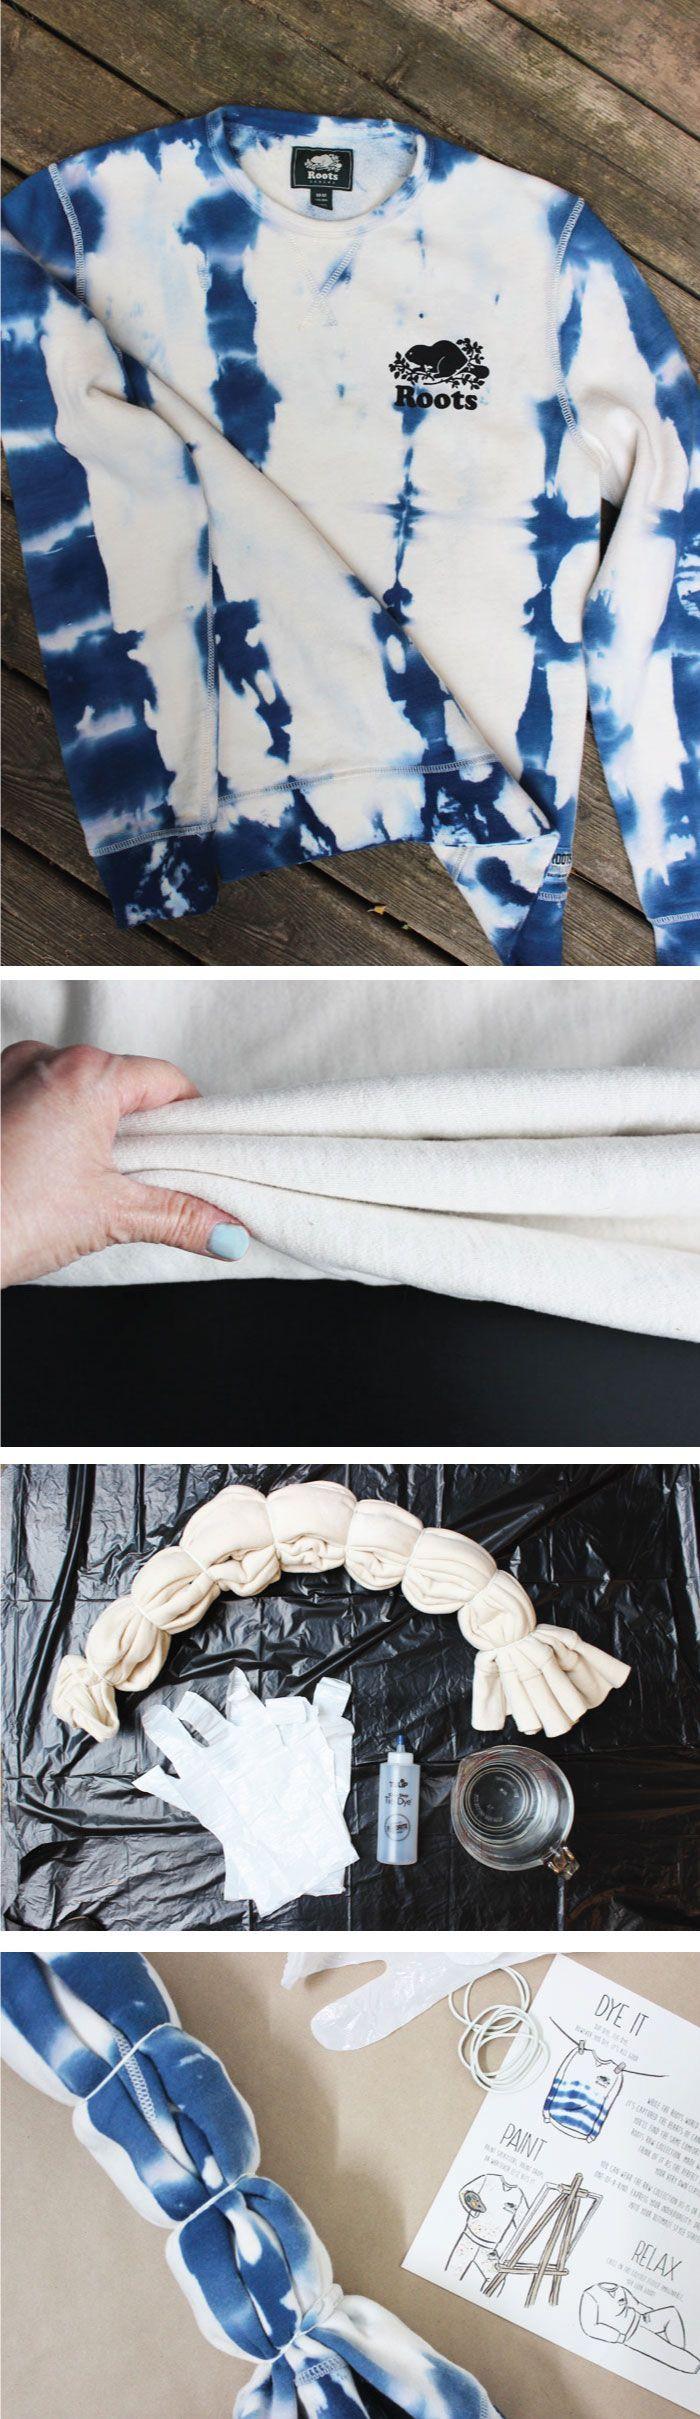 DIY Shibori - a super-easy way to get the shibori look using tie-dye ink! #diy #shibori #summerfun